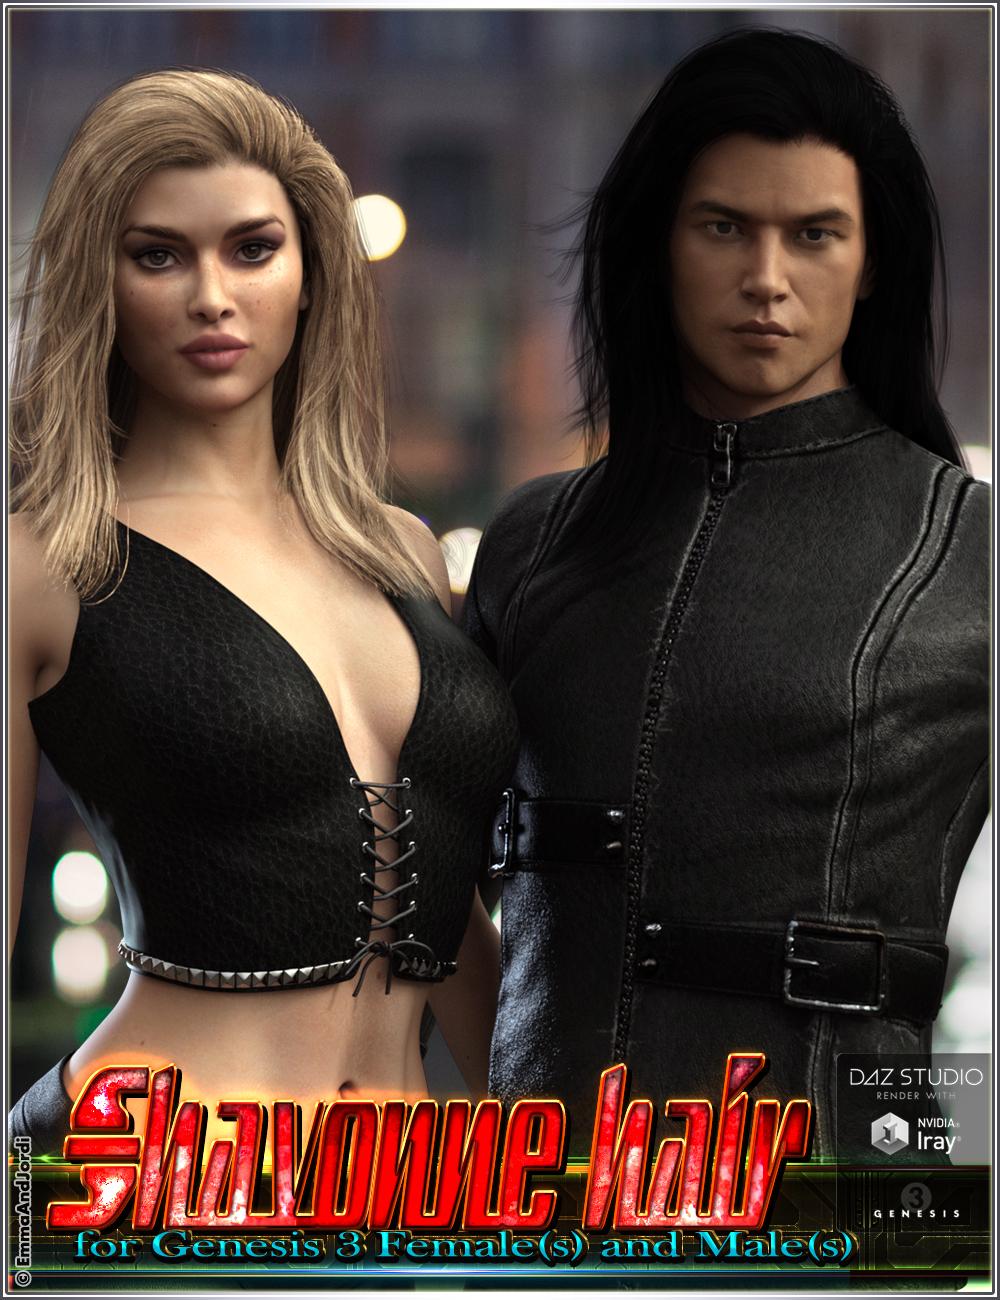 Shavonne Hair for Genesis 3 Female(s) and Male(s) by: EmmaAndJordi, 3D Models by Daz 3D